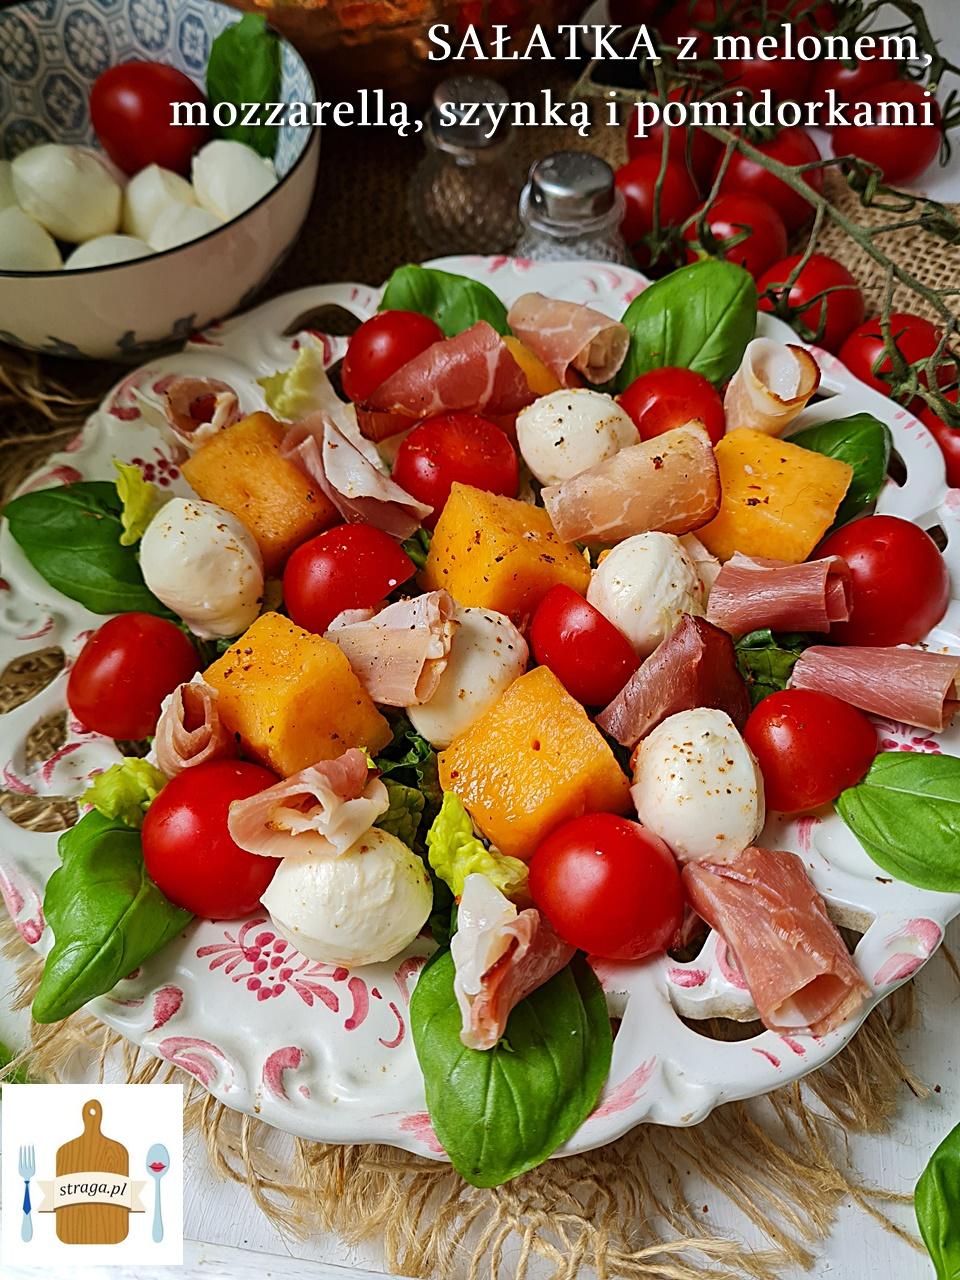 letnia sałatka z melonem